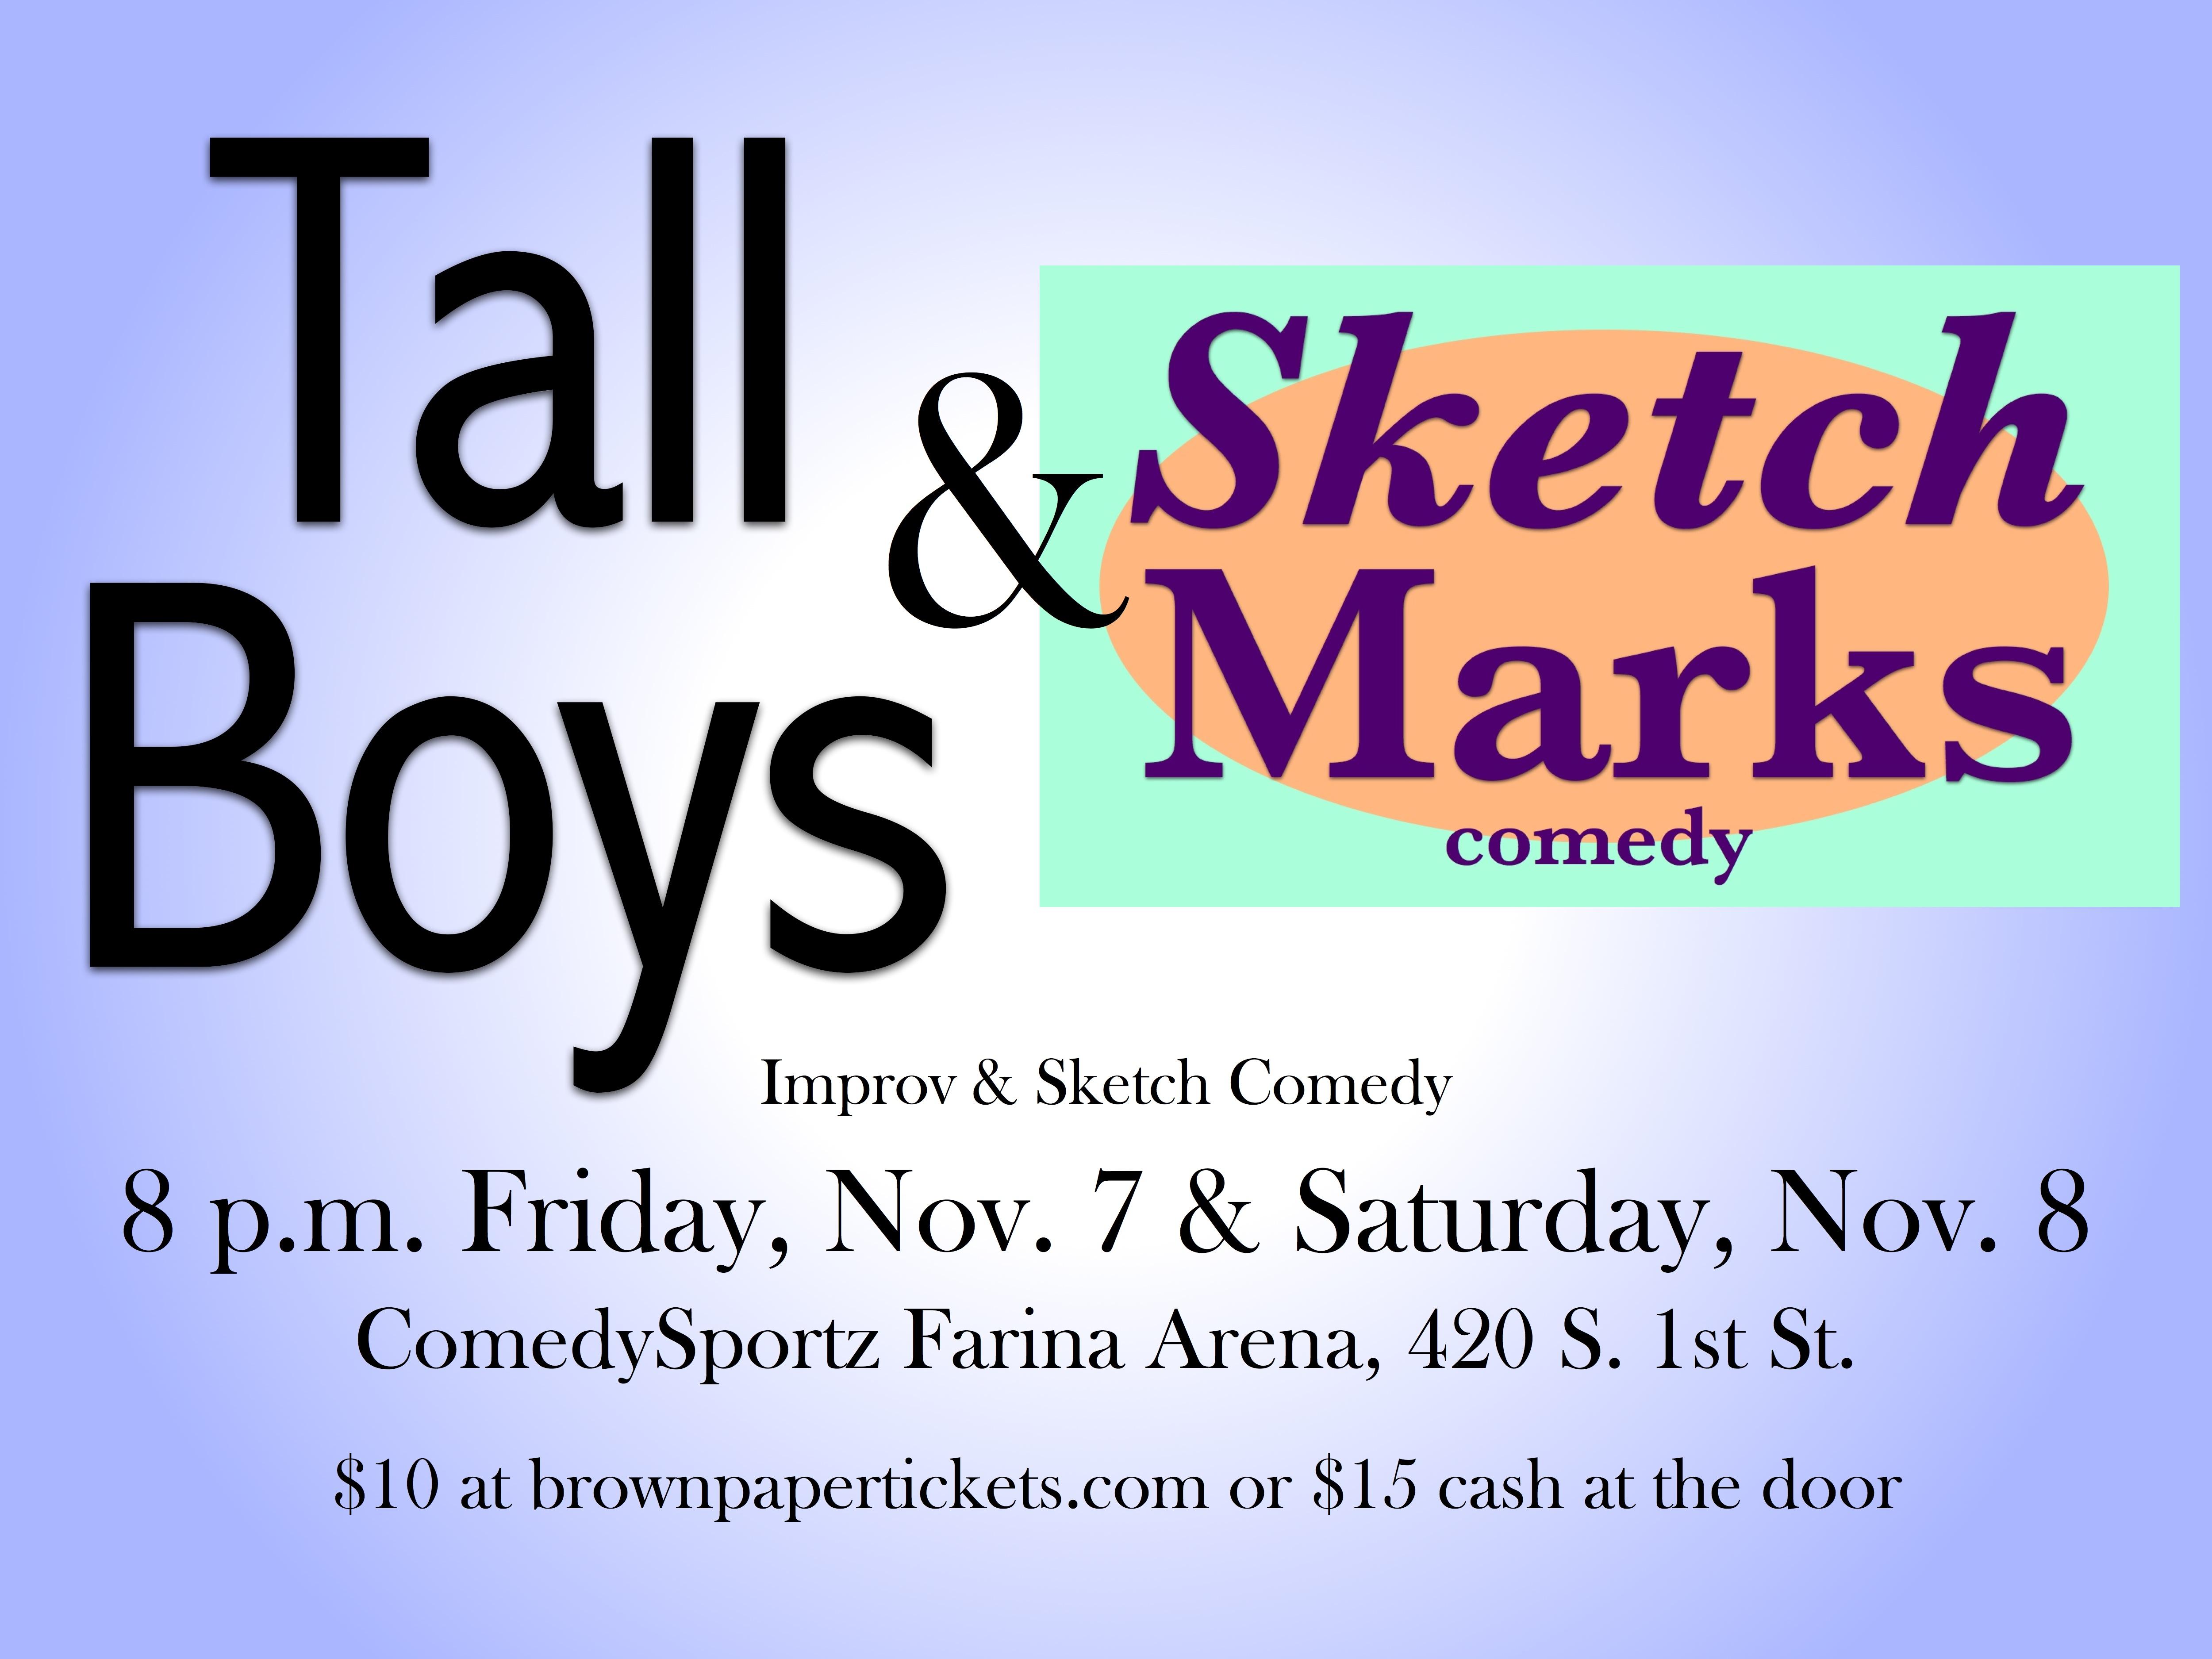 Tall_Boys_Sketch_Marks